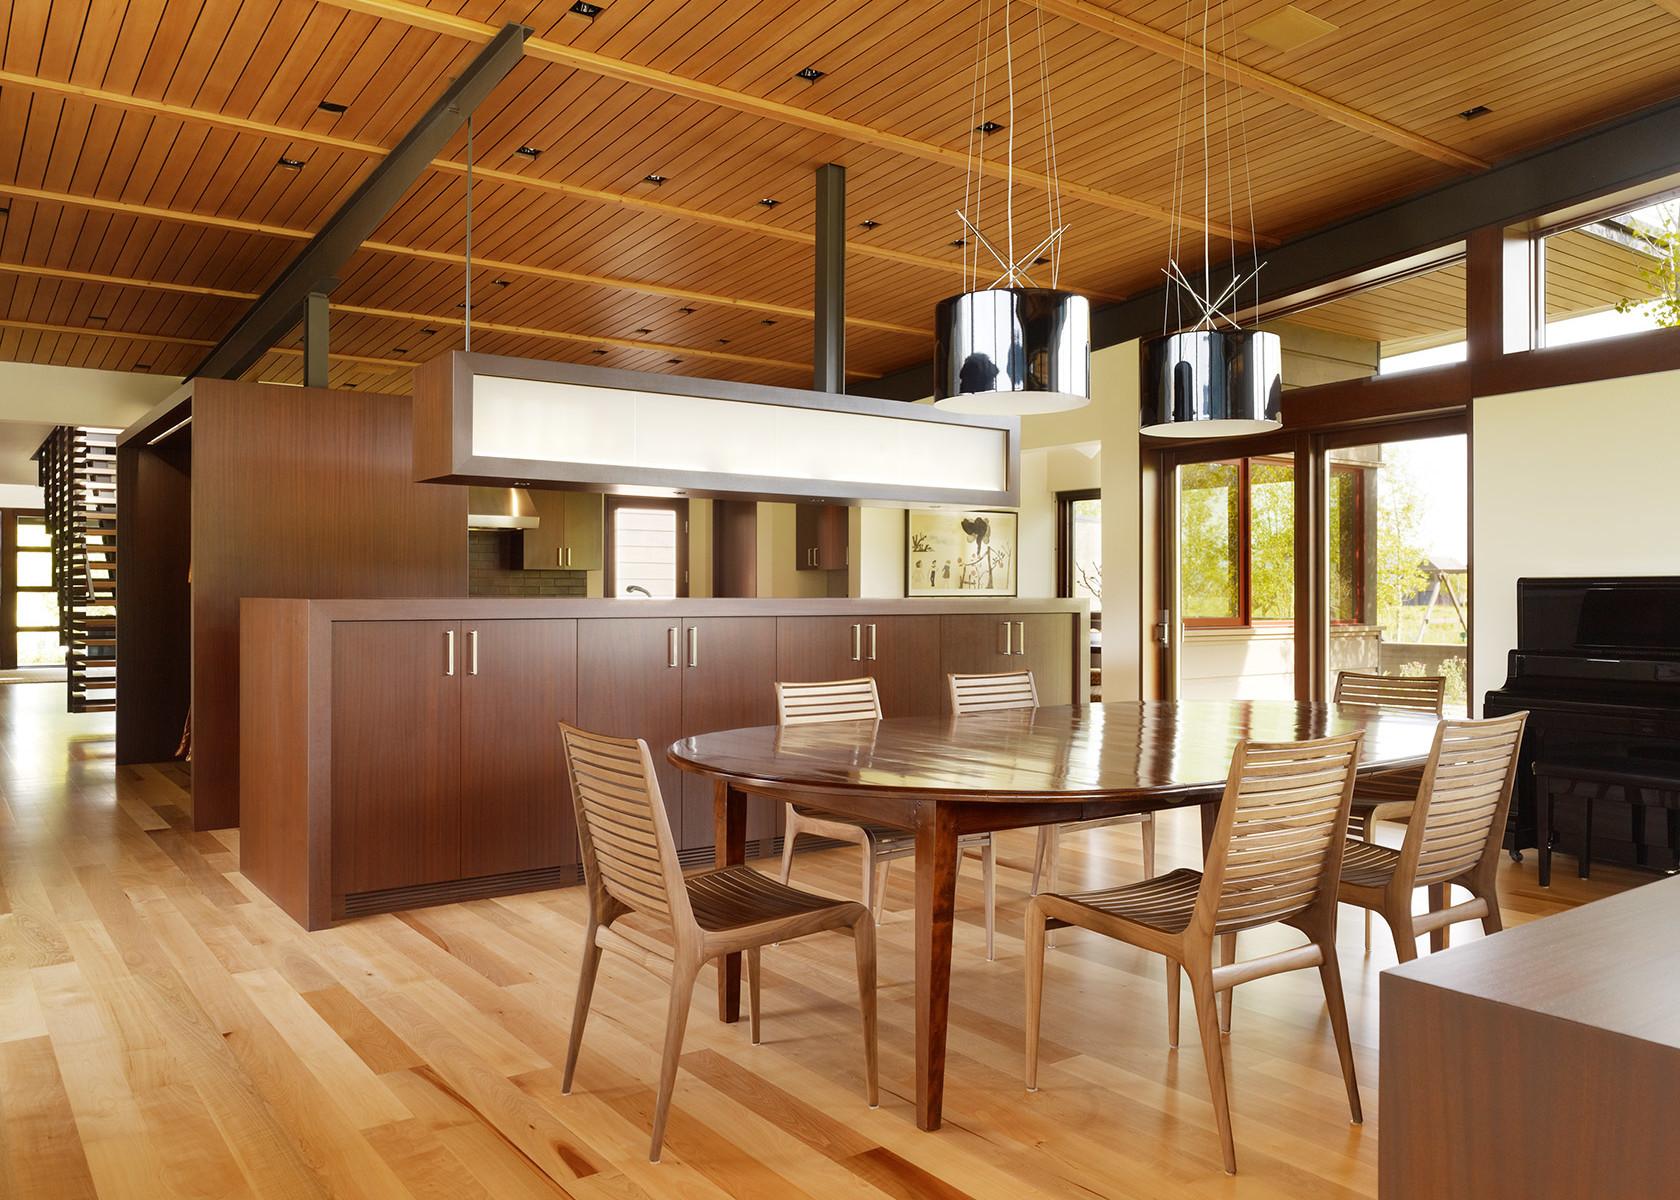 Top 15 Best Wooden Ceiling Design Ideas  Small Design Ideas